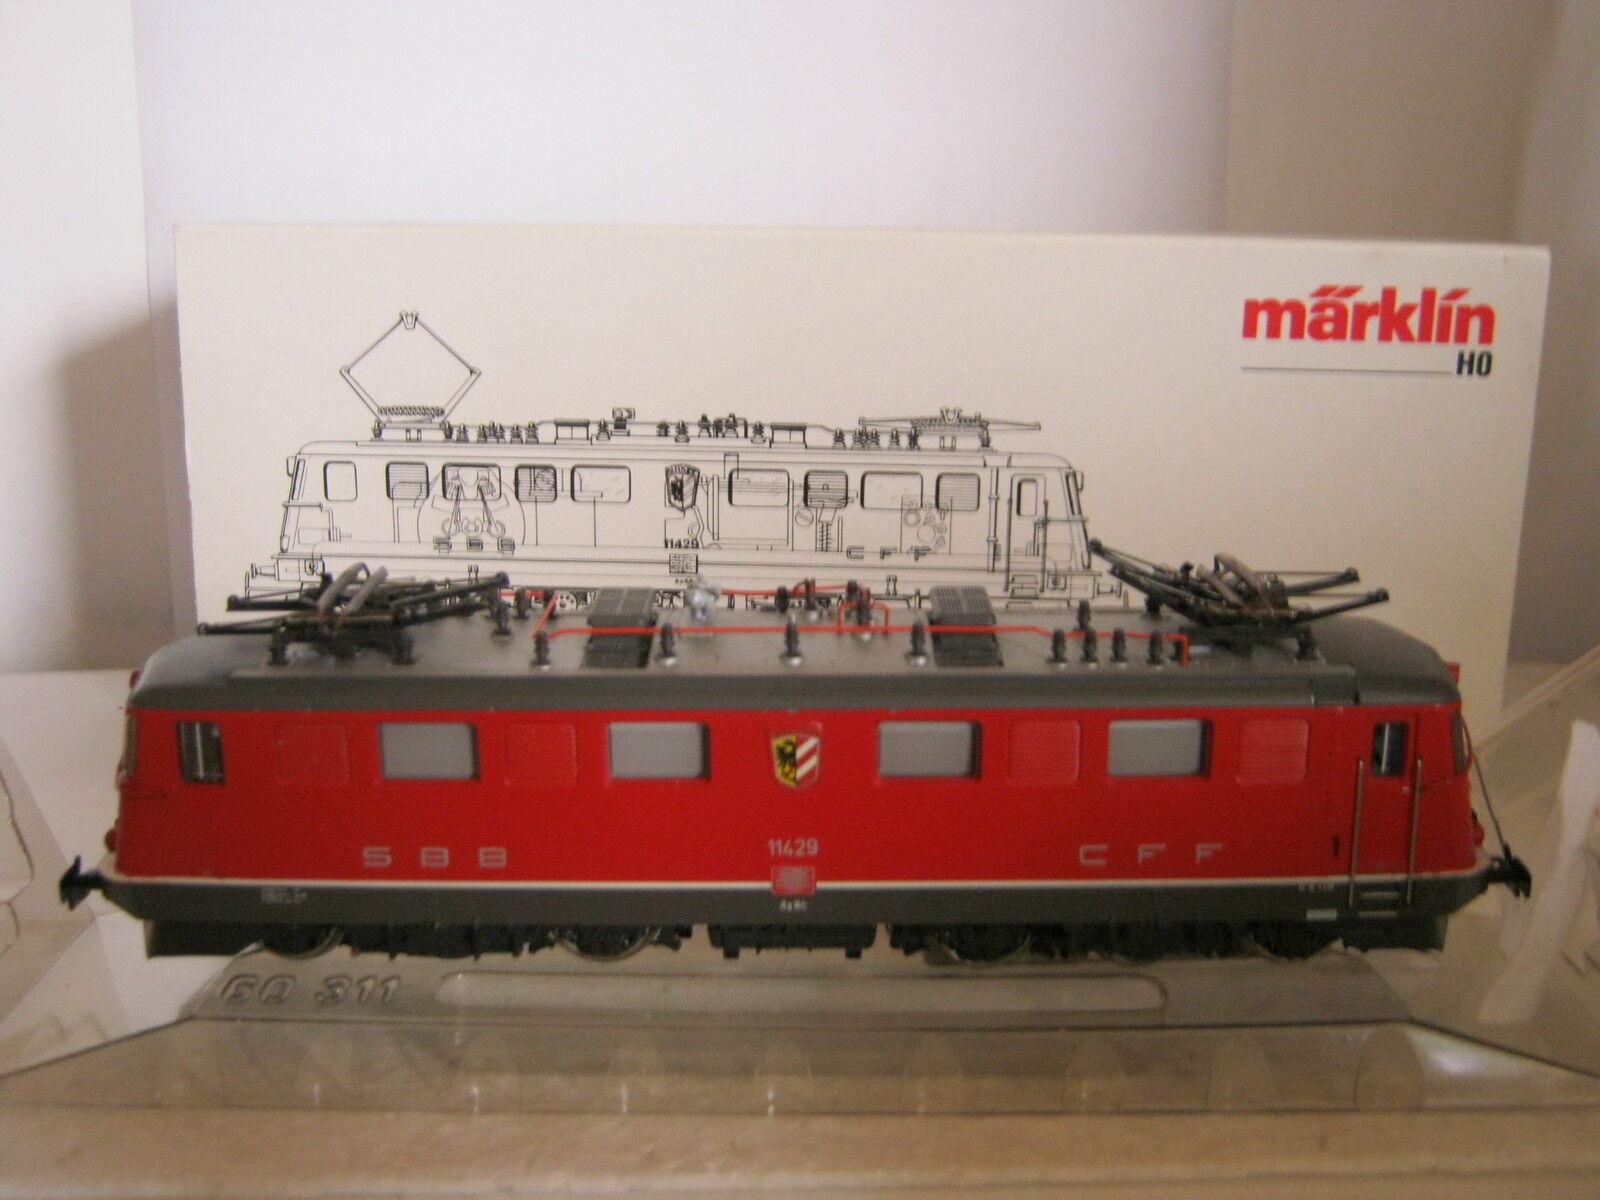 Marklin ho 3332 Elektro Lok Altdorf BTR. nr 11429 SBB CFF rosso (rg af 118s2)